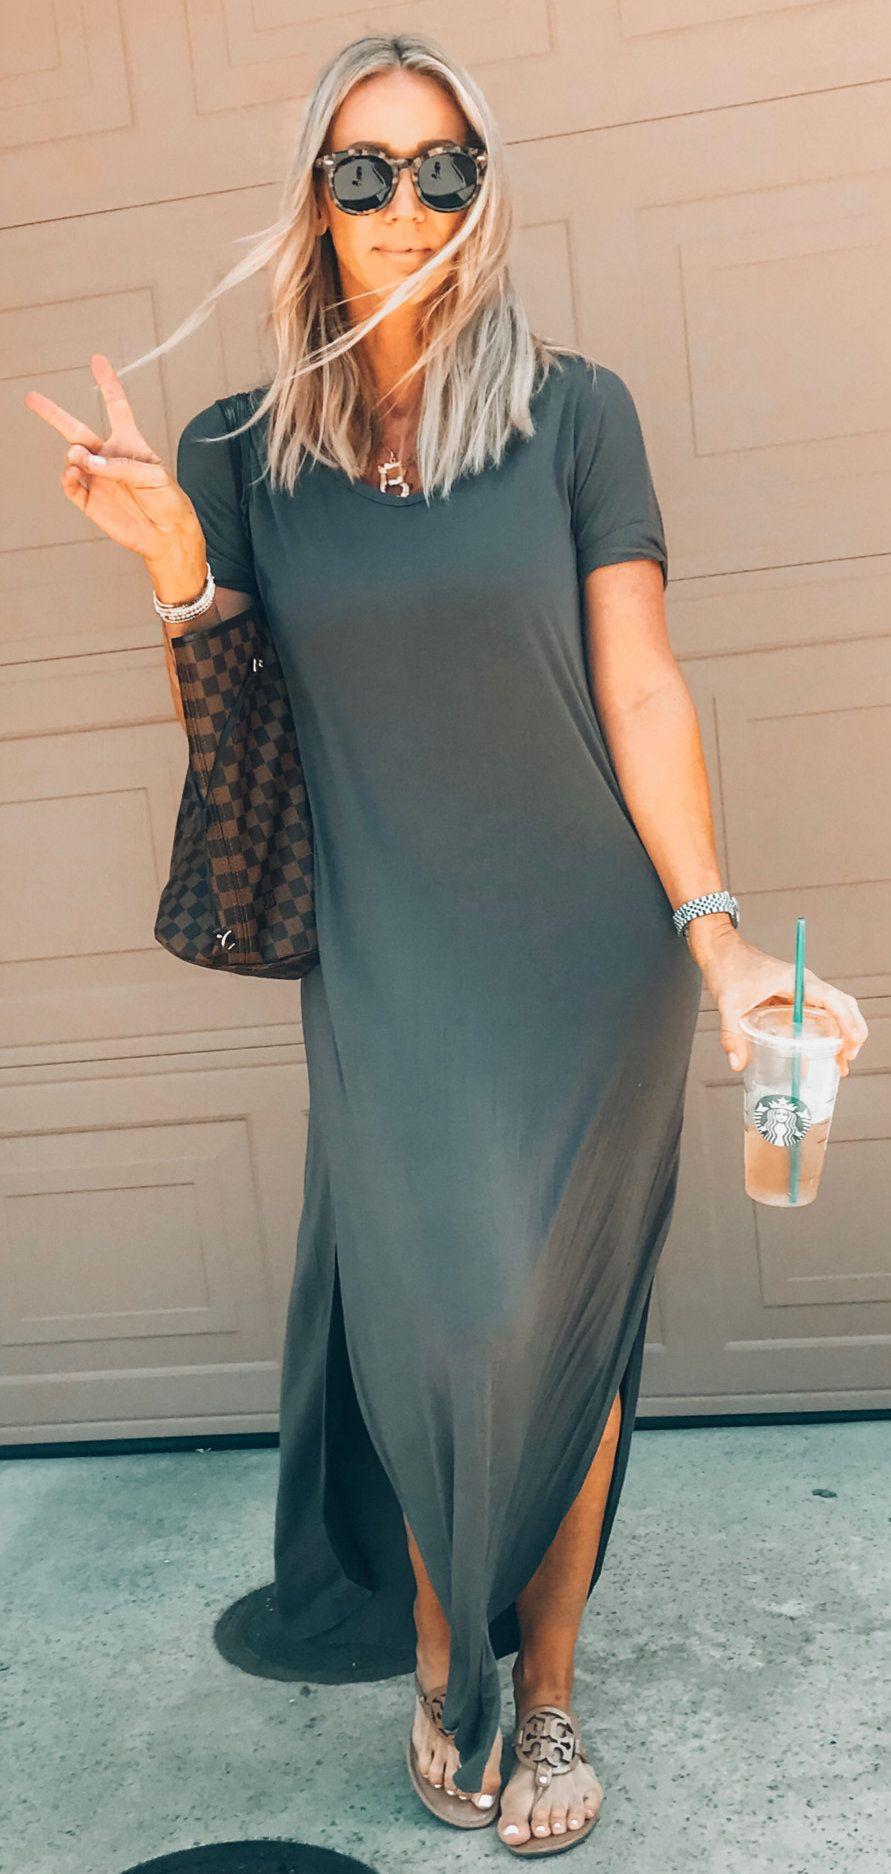 gray short-sleeved dress #summer #outfits